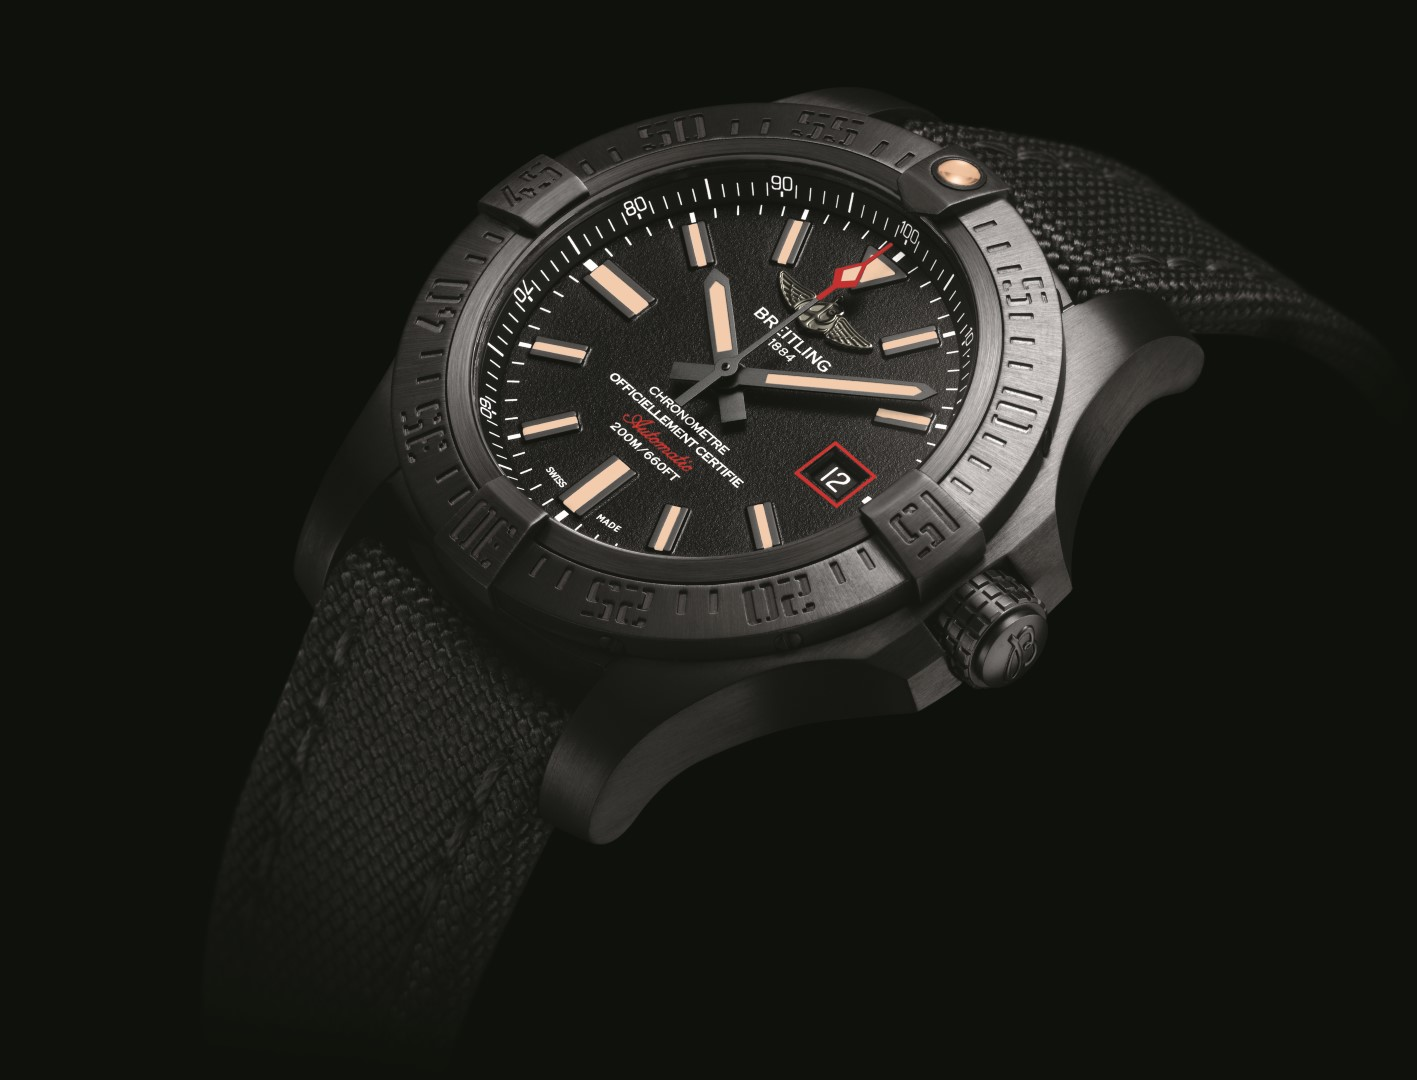 f3b4046e1 Nuevo Breitling Avenger Blackbird 44 mm. | Horas y Minutos